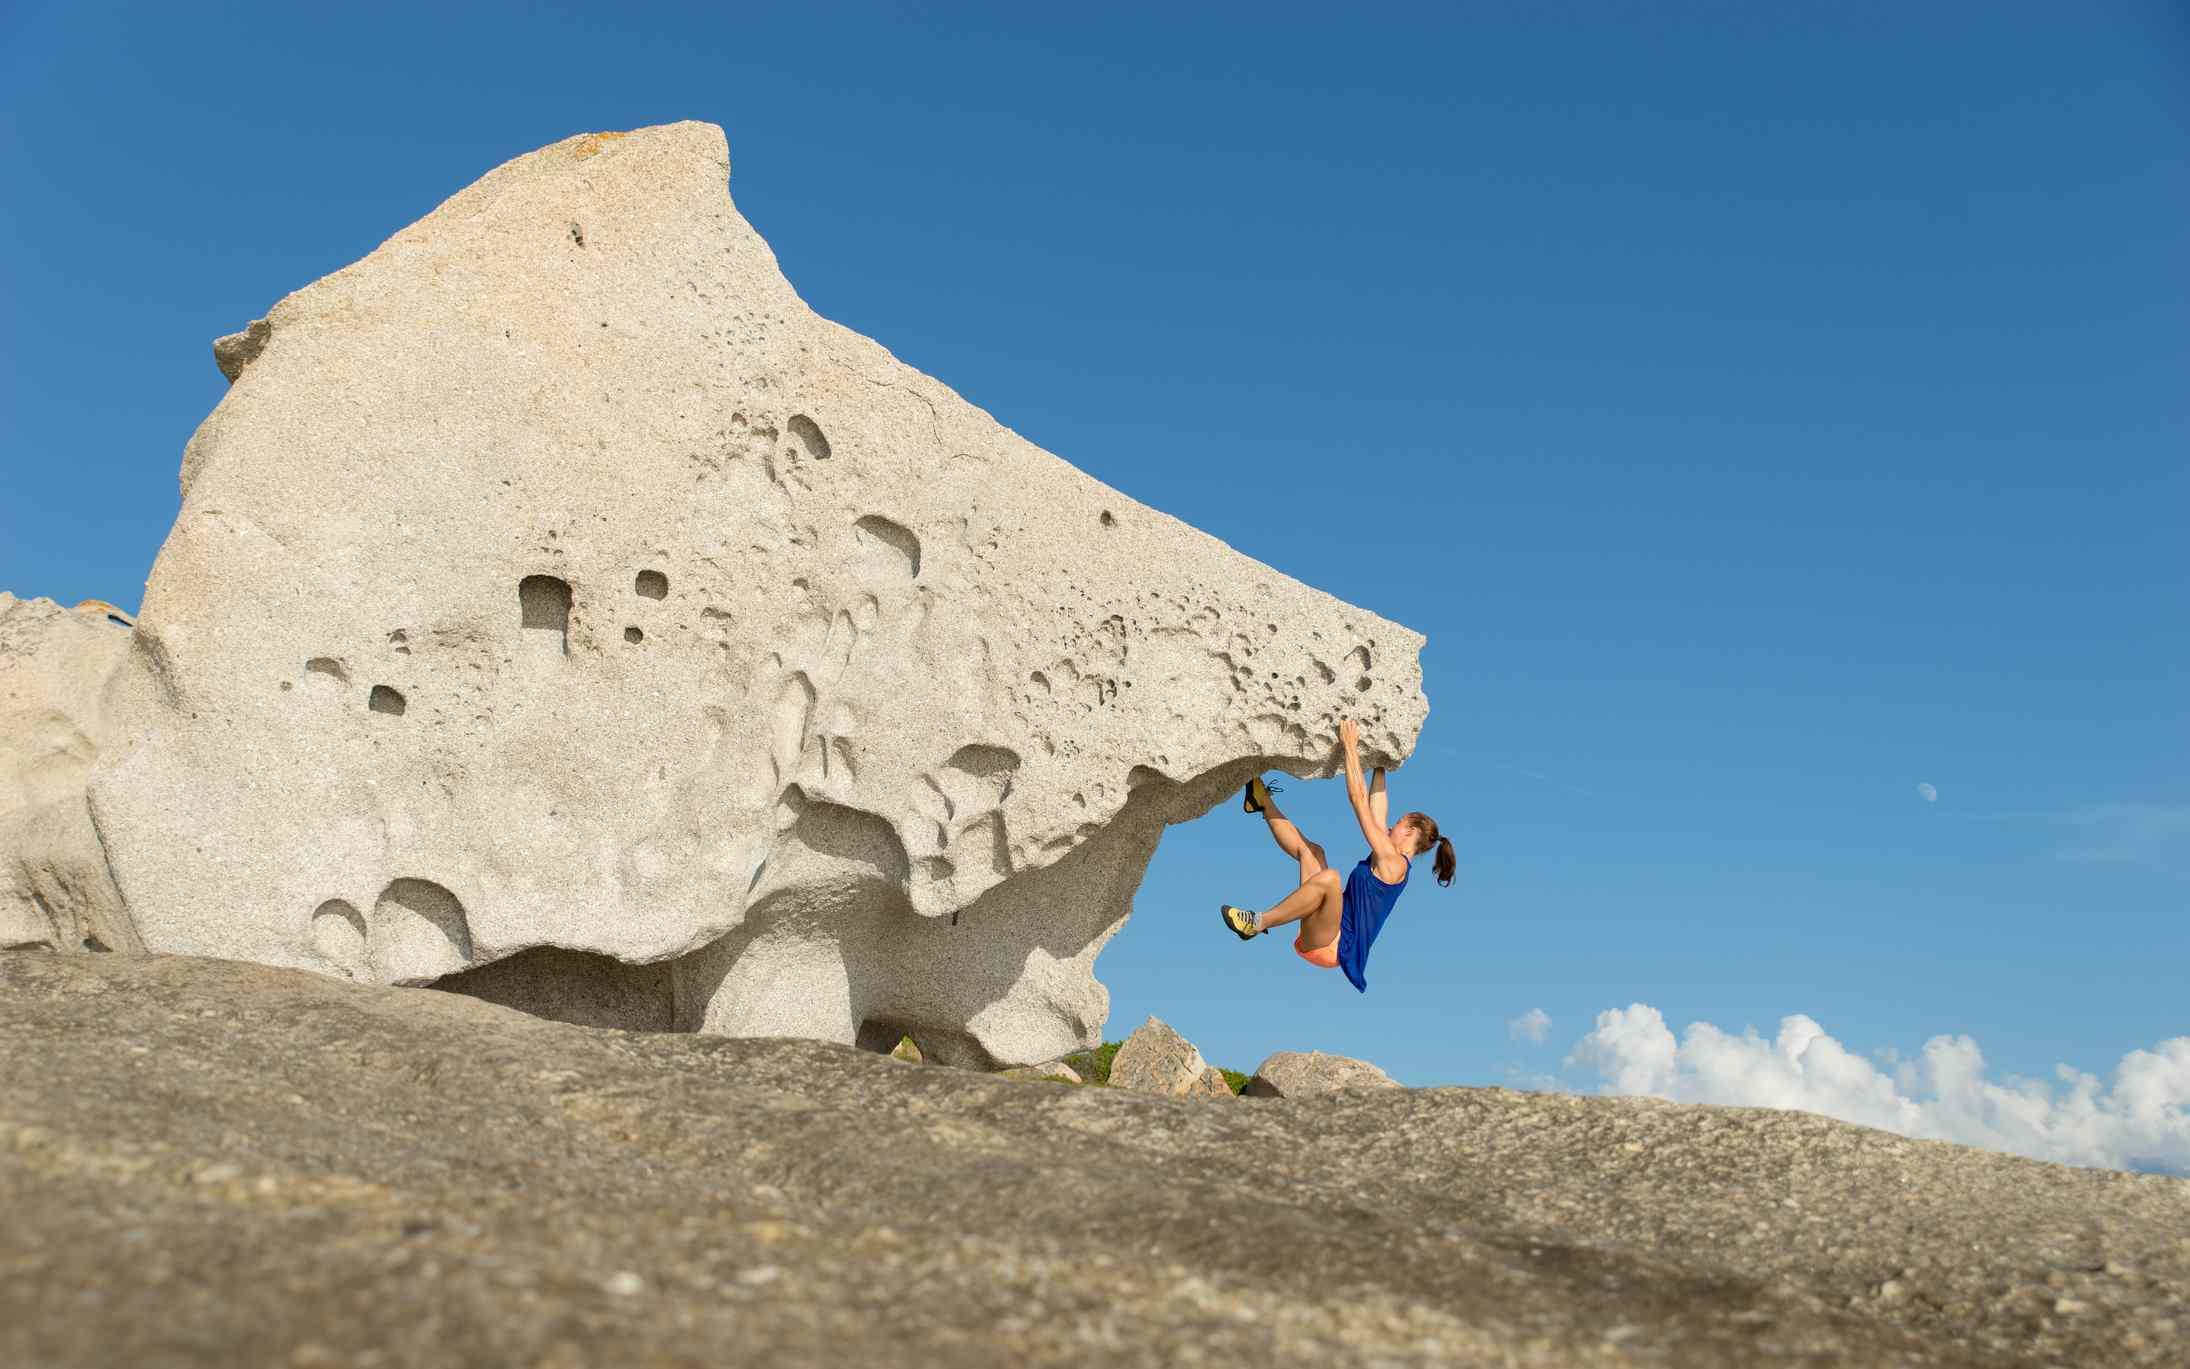 France, Corsica, Woman climbing on big single rock